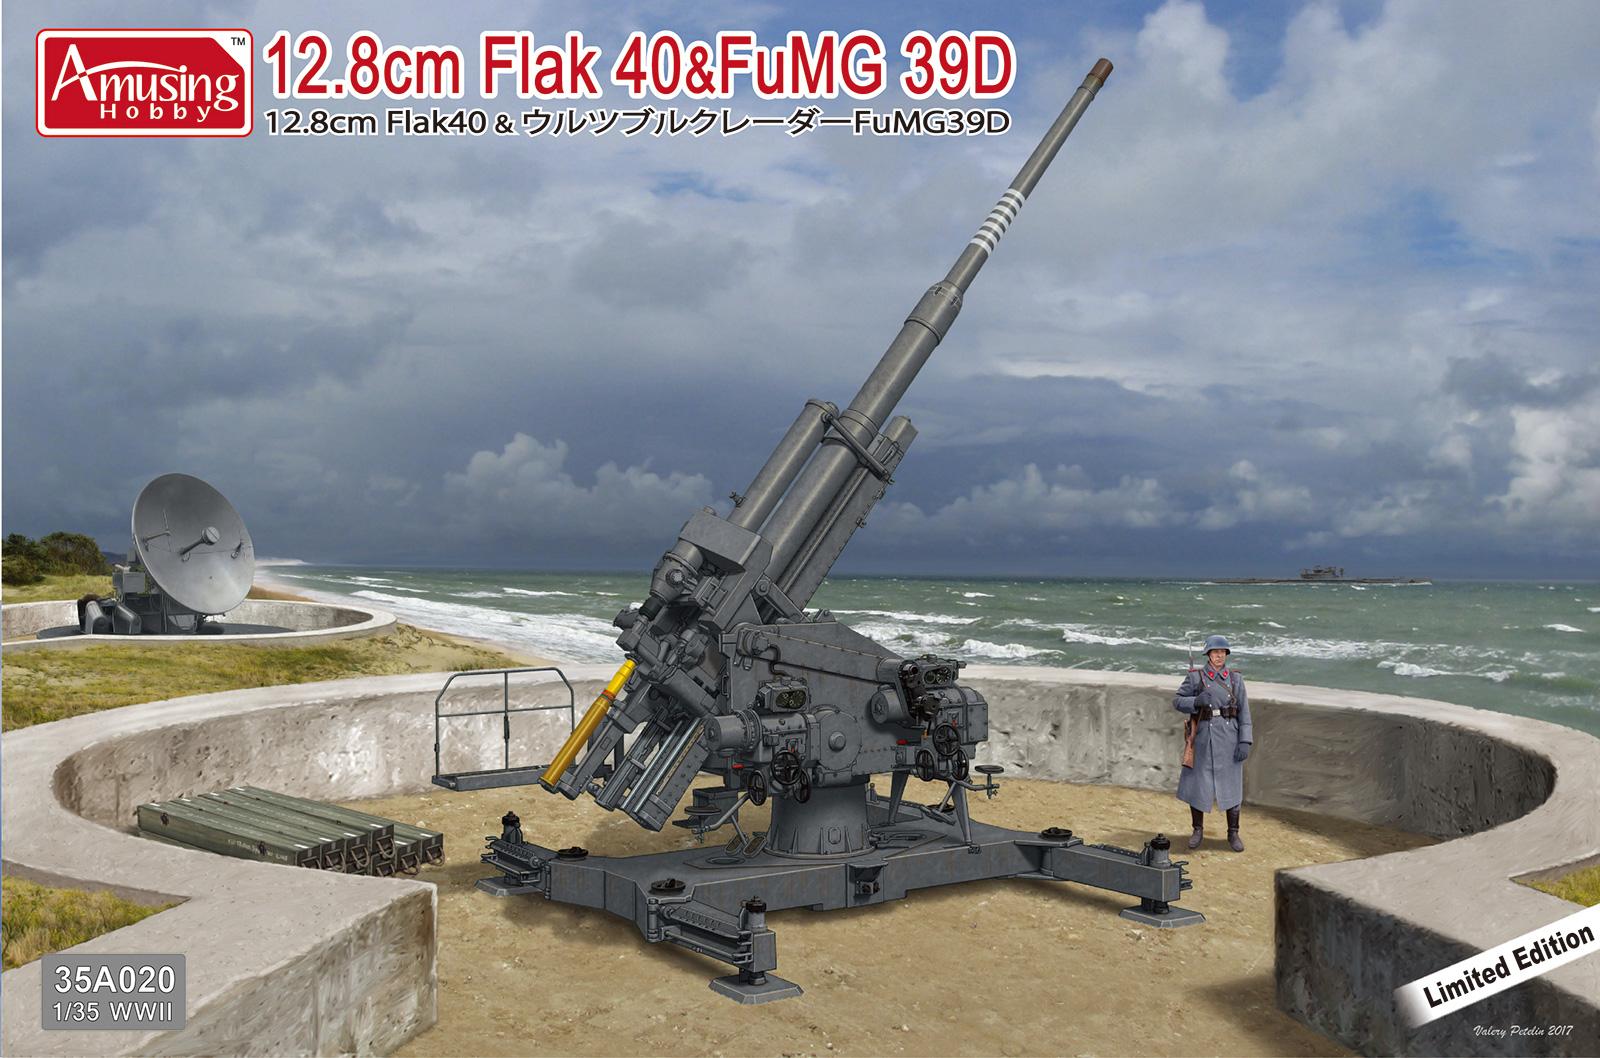 Amusing Hobby 12.8cm Flak 40&FuMG 39D